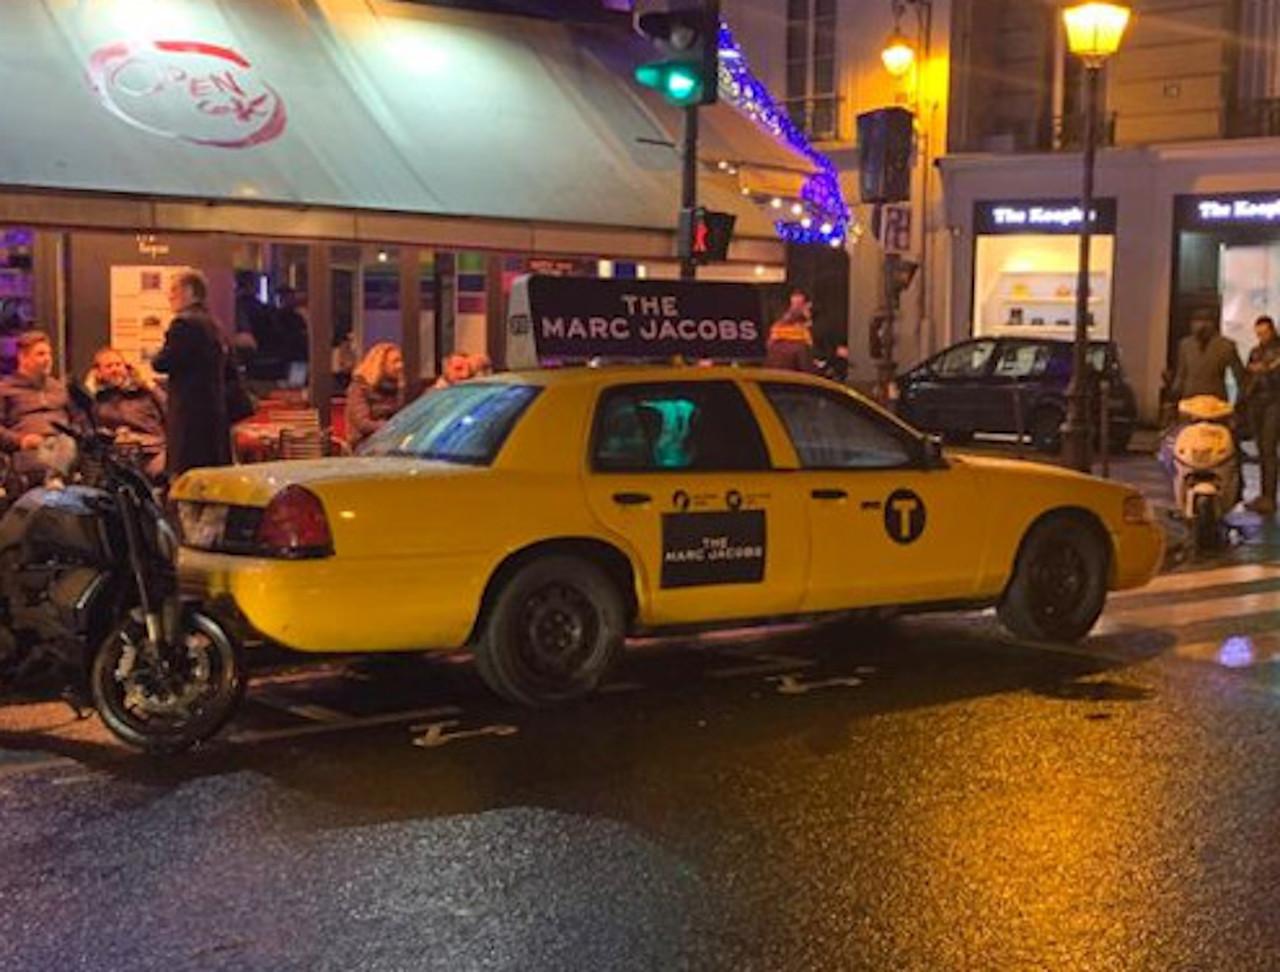 Taxi new-yorkais Yellow Cab Crown Victoria avec signalétique Marc Jacobs